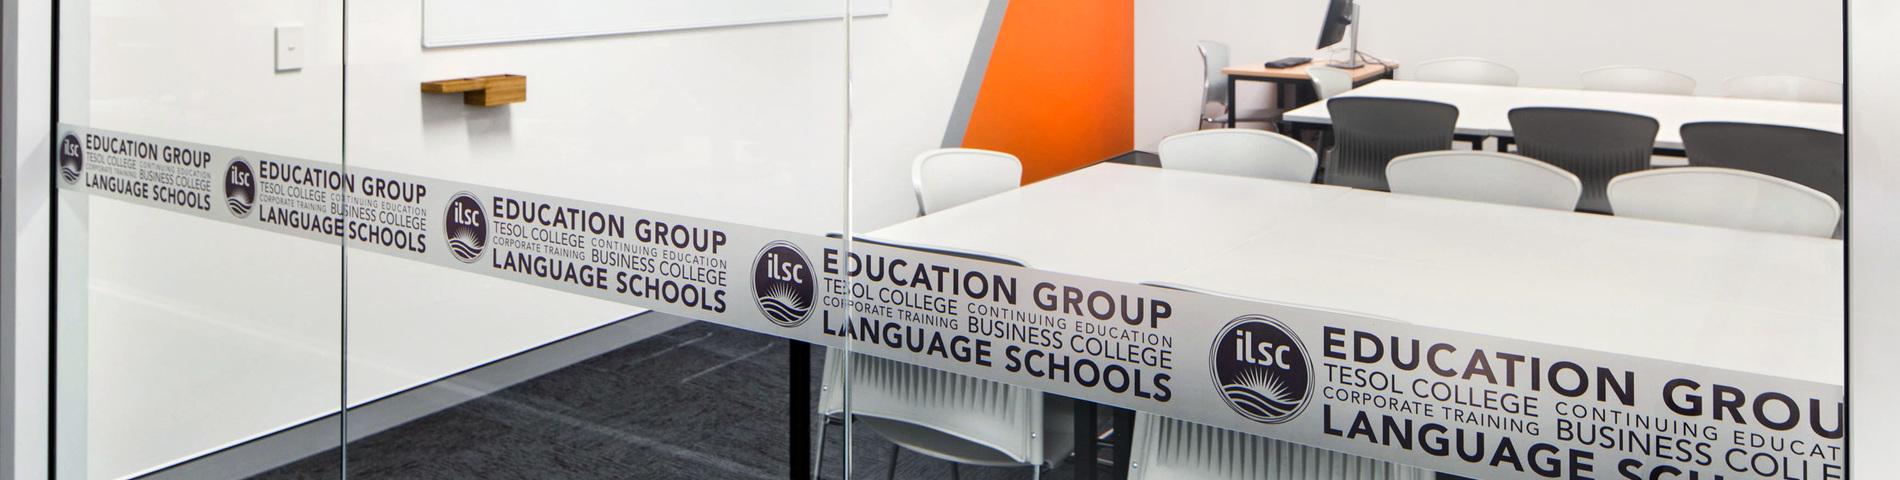 ILSC Language School รูปภาพ 1